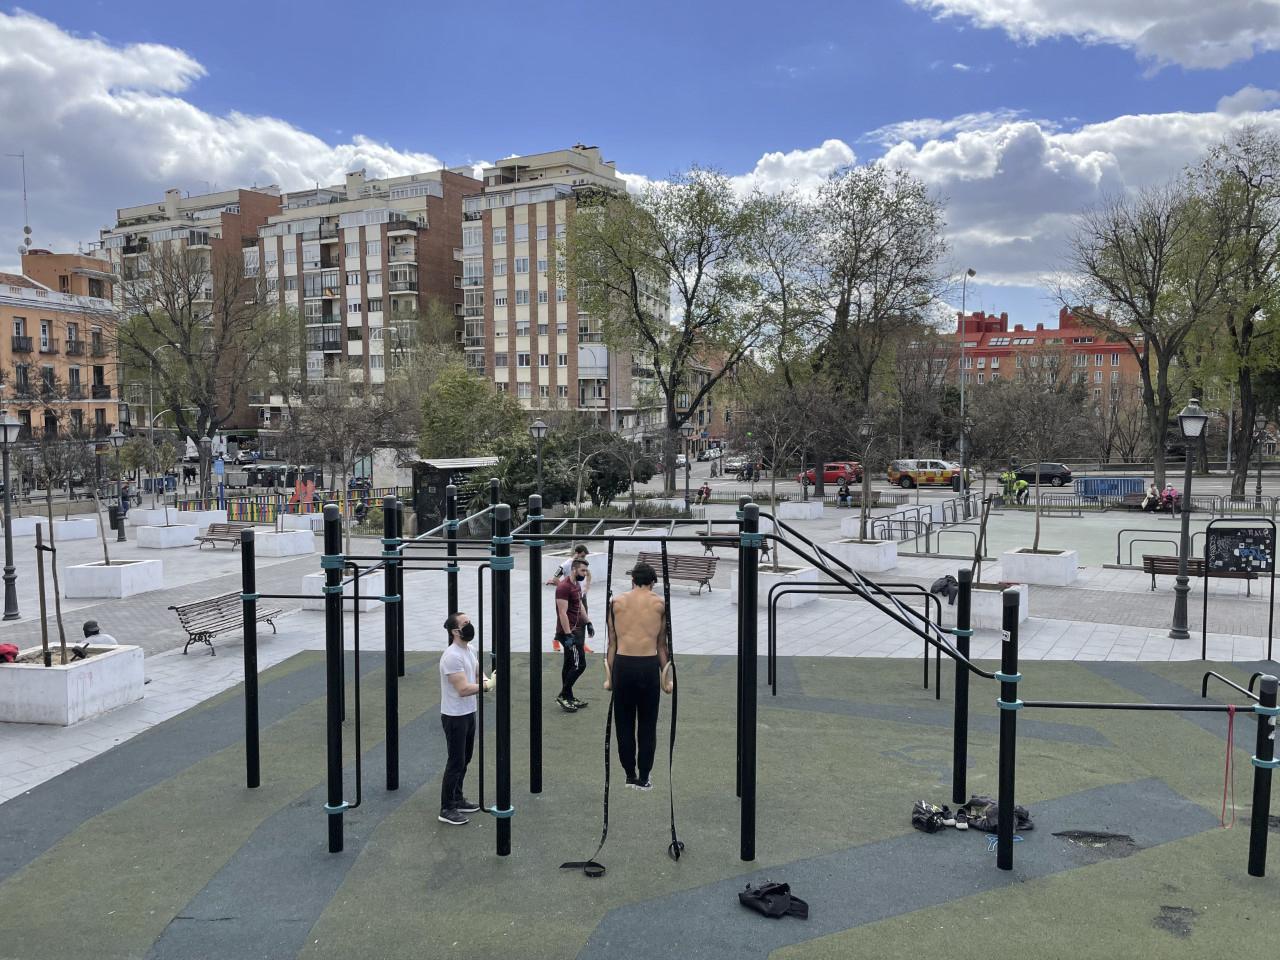 Gimnasia urbana en la plaza del Campillo Nuevo. Firma: EM